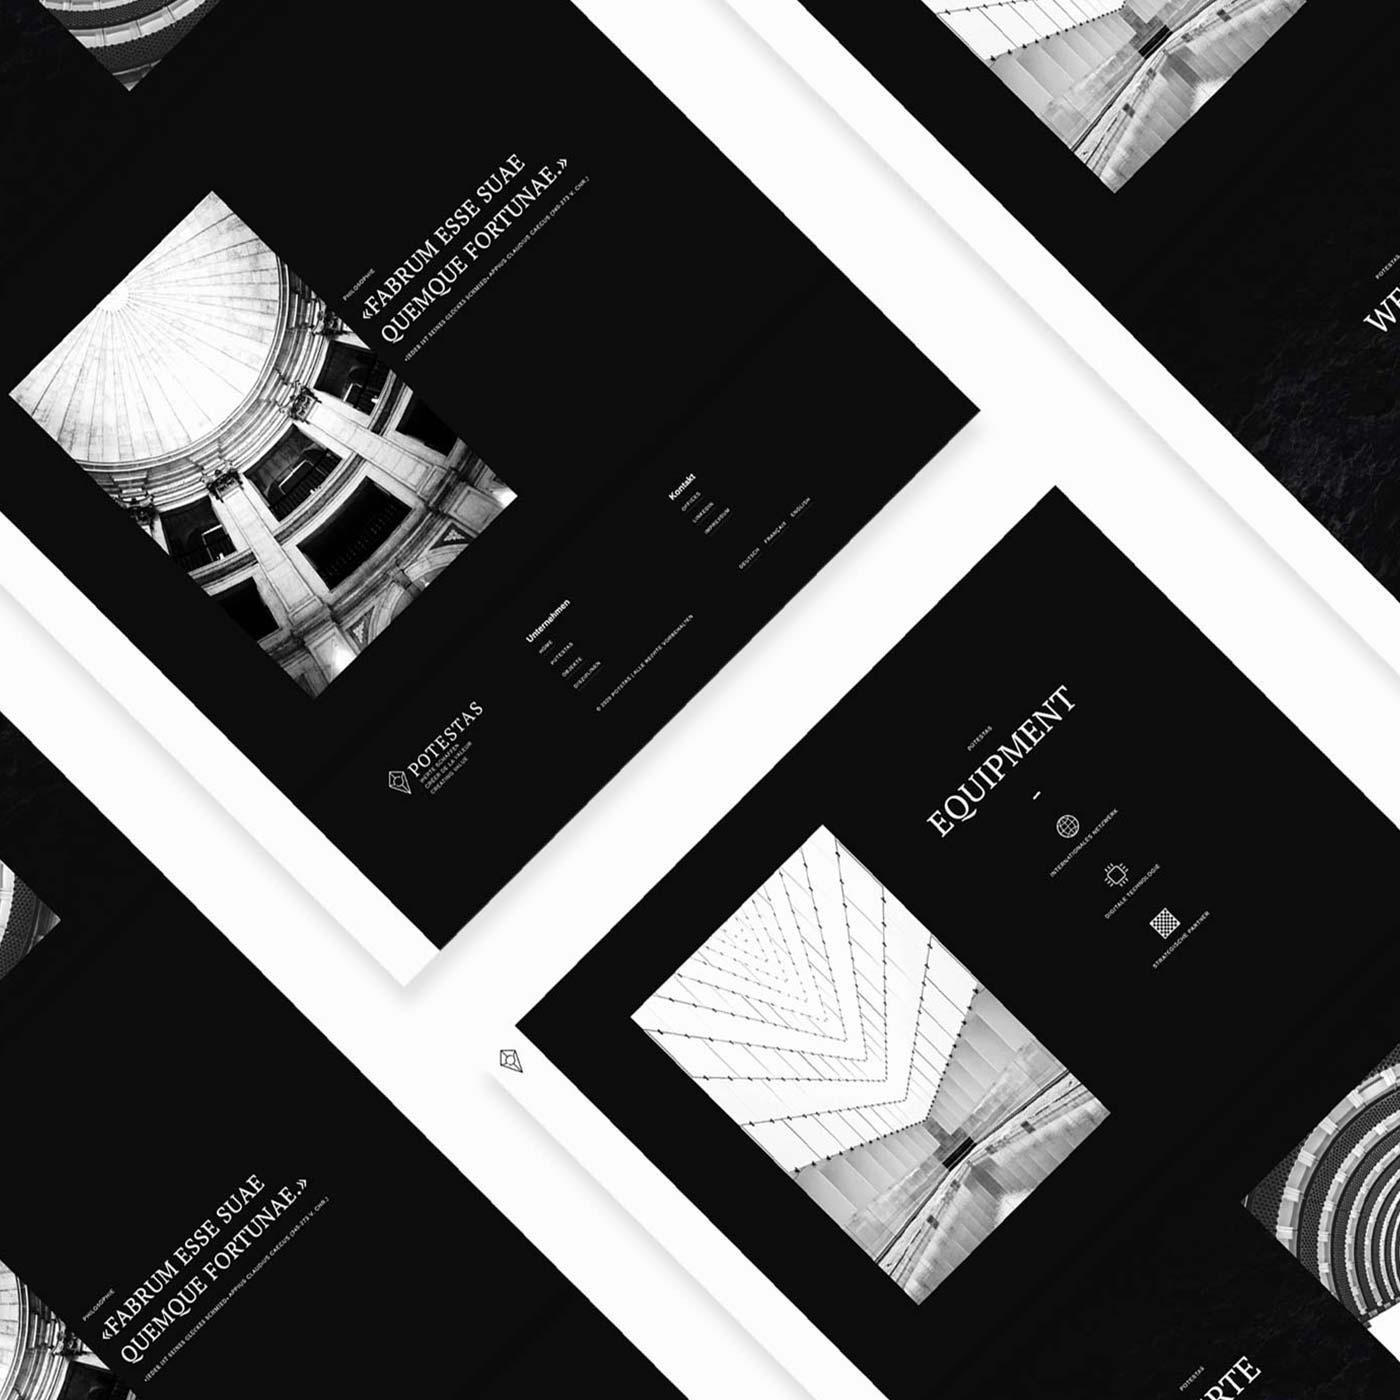 Web design real estate company Switzerland